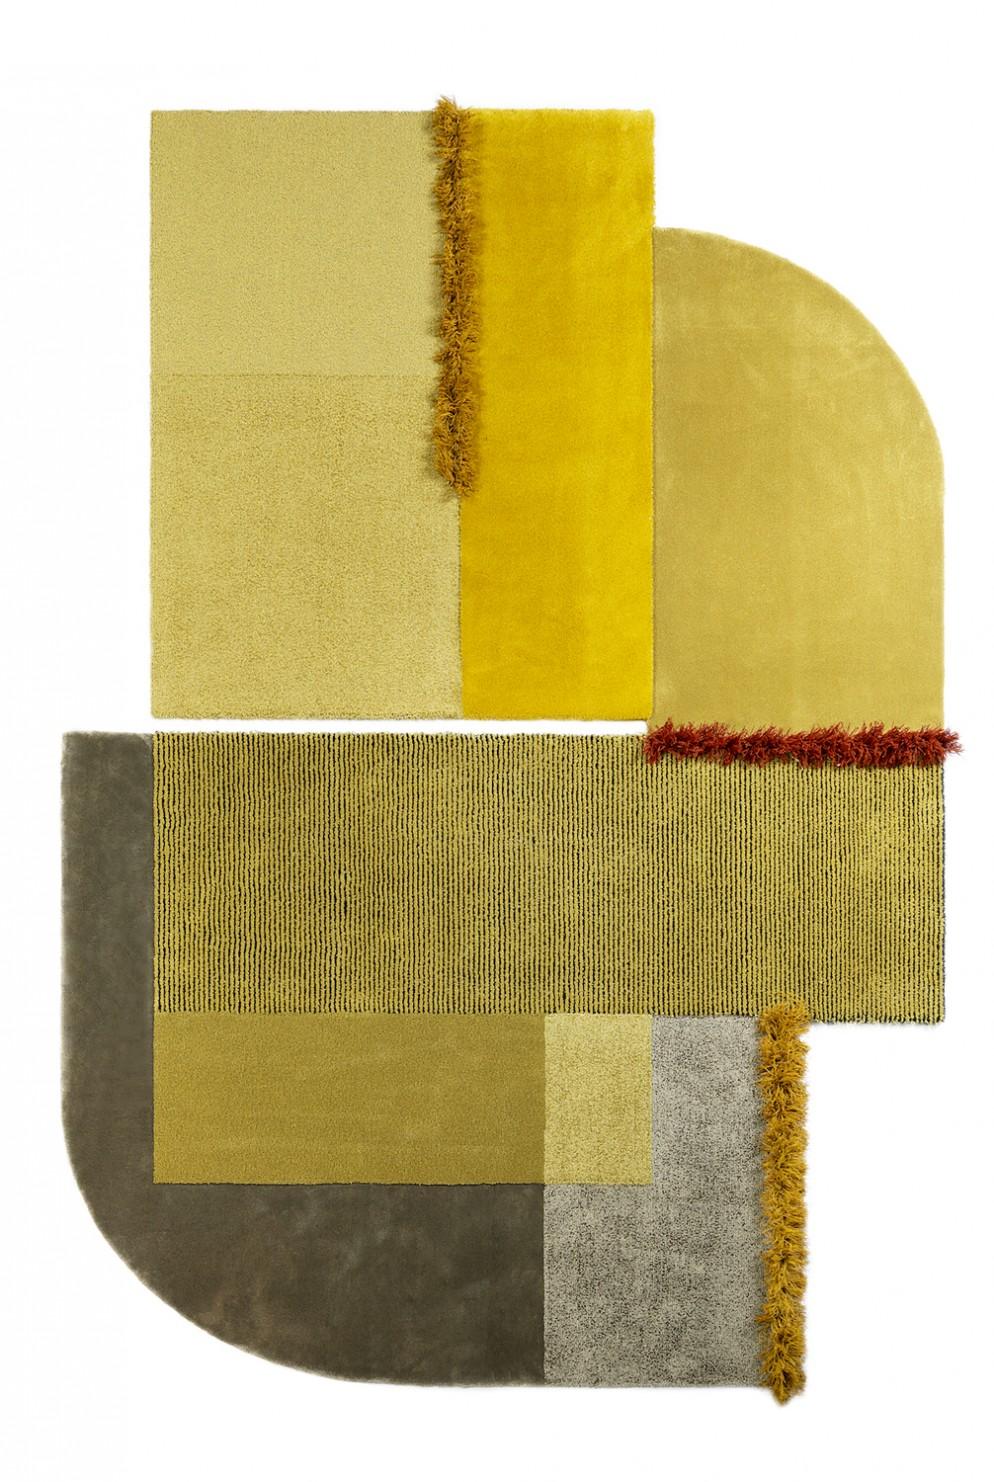 tappeti-moderni-forme-strane-Carpet Edition_Selce by Studio Salaris (1)-living-corriere